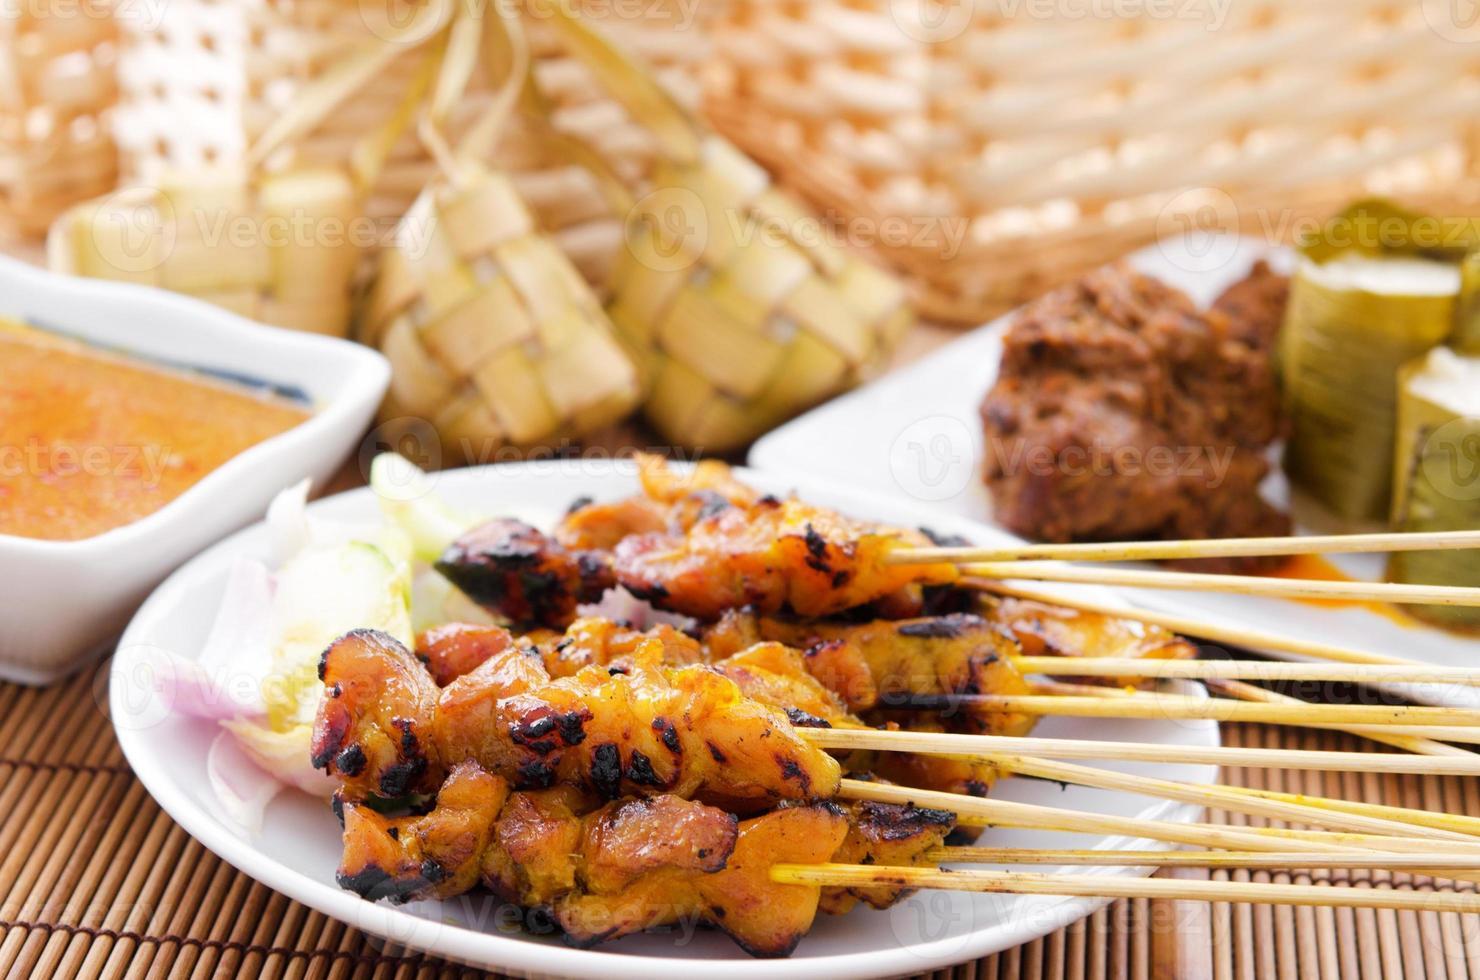 Hühnchen Satay und Ketupat foto